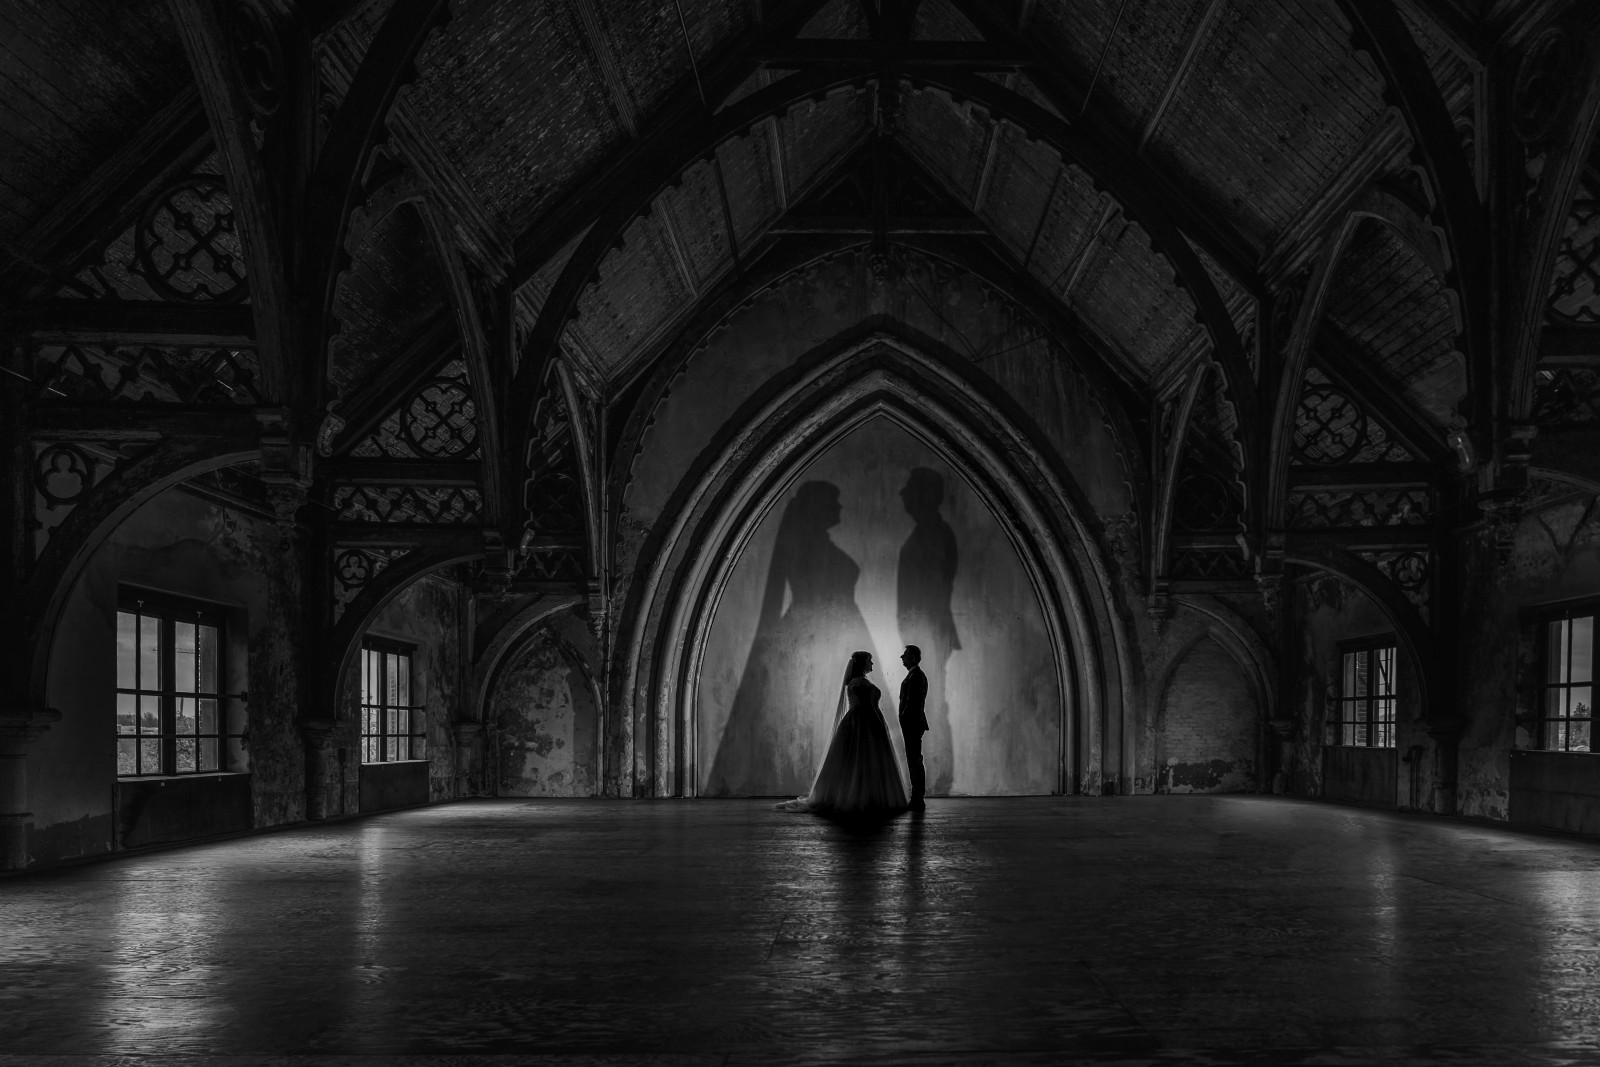 Bruidsreportage in de Metaal Kathedraal